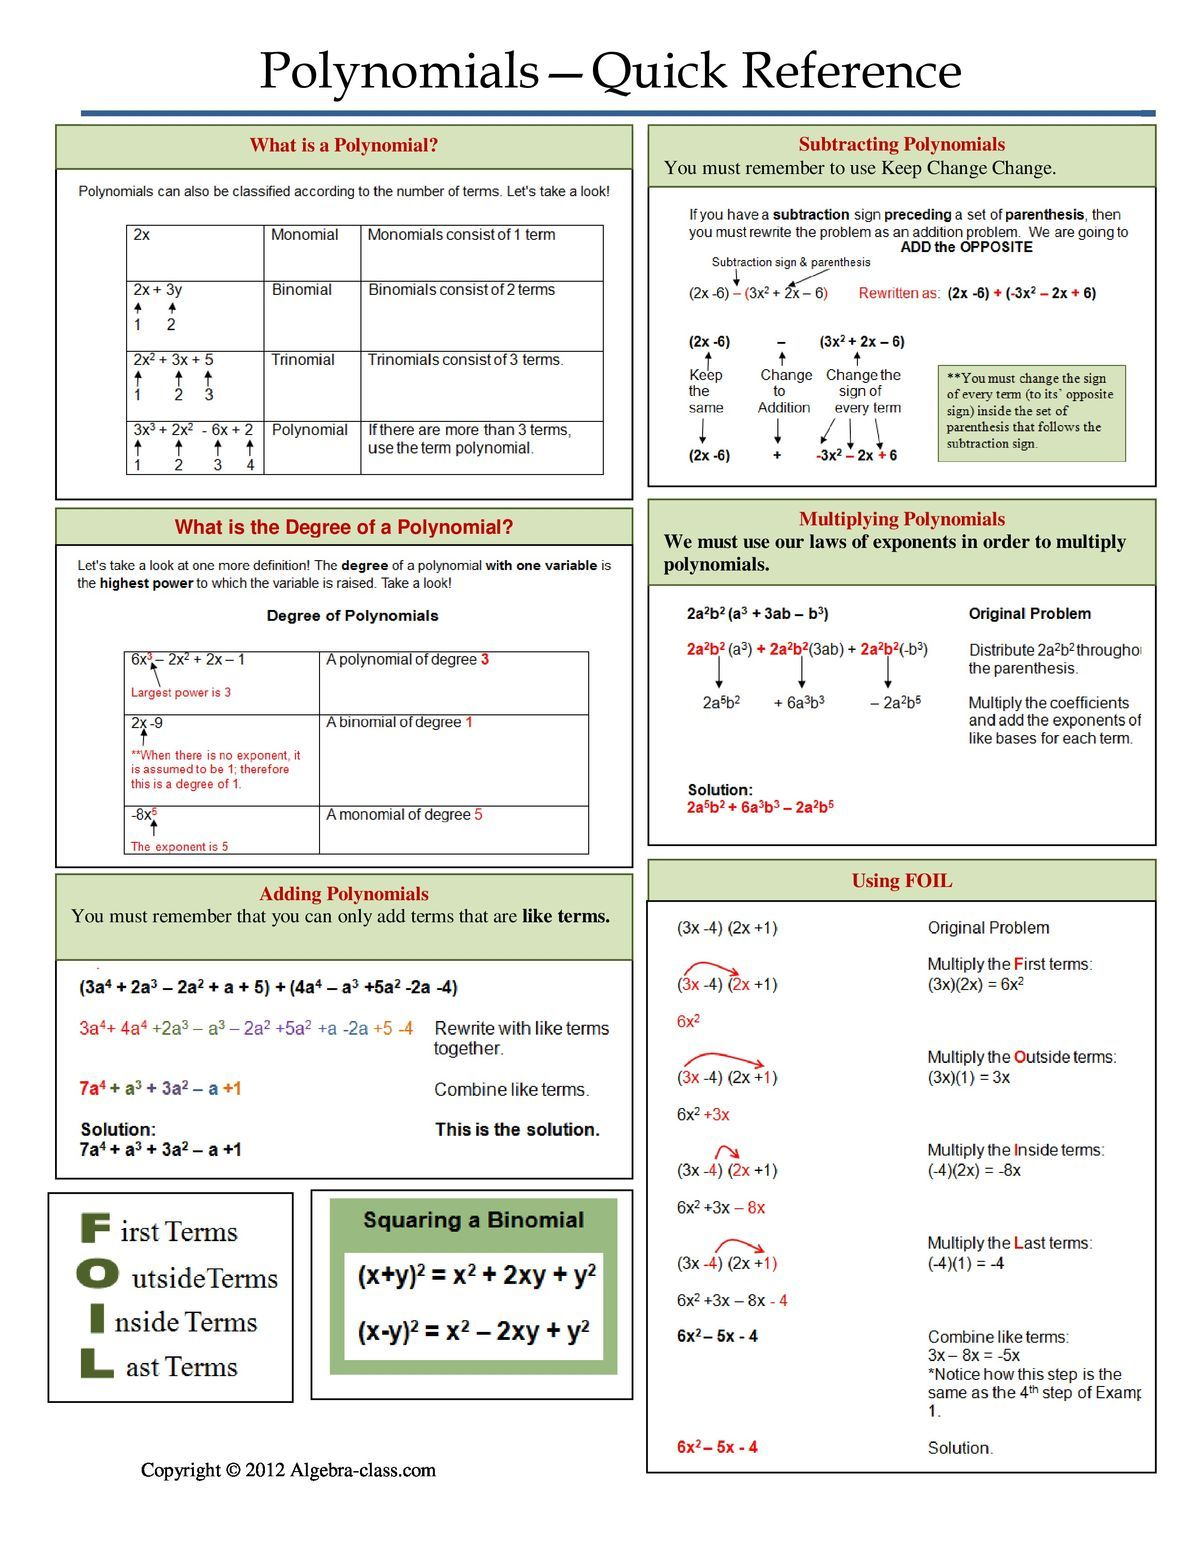 1677123da7a54762aa7928ed0463e075 Jpg 1 200 1 552 Pixeles College Math Studying Math Polynomials